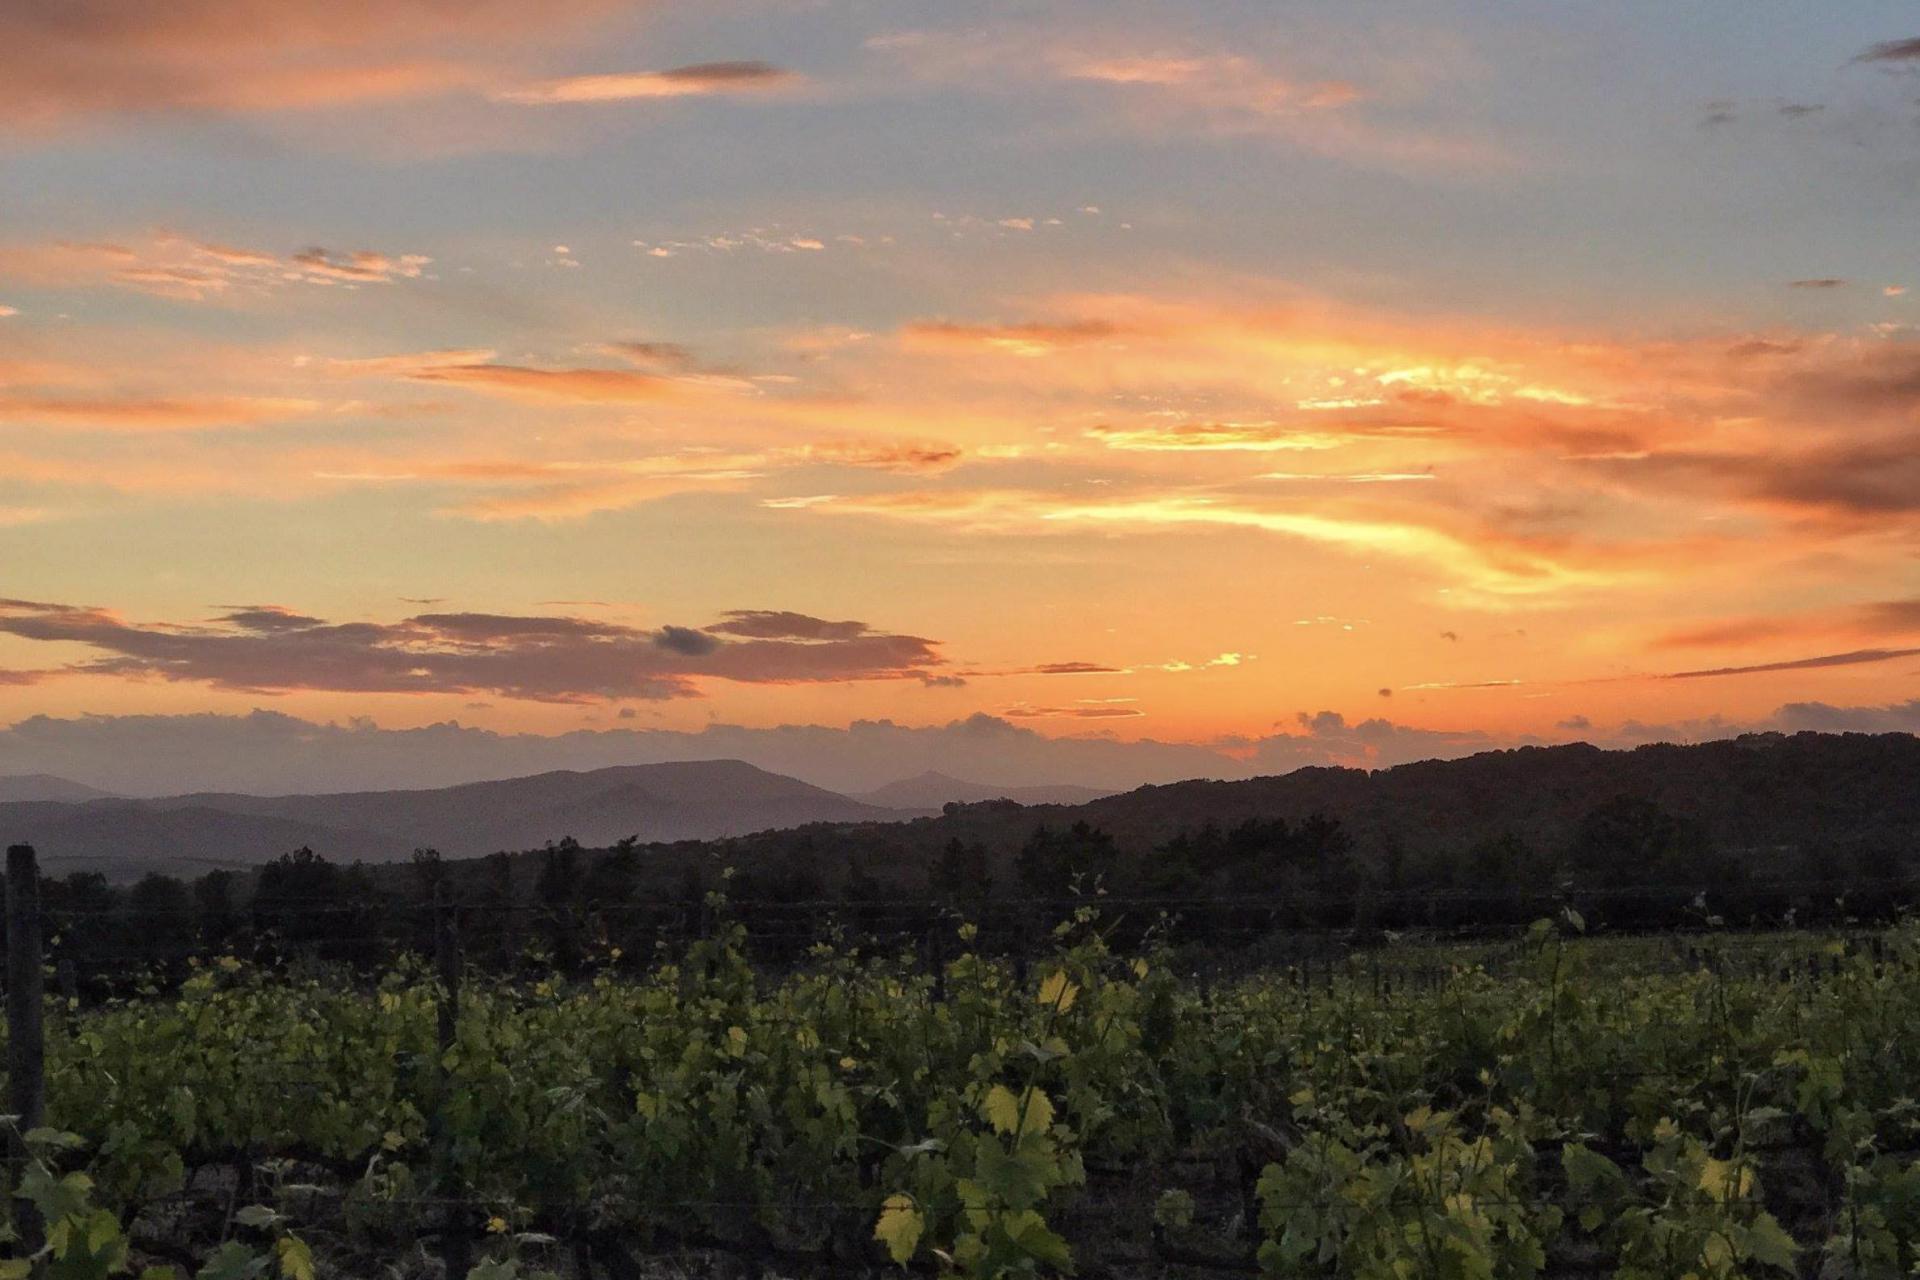 Agriturismo Toskana Urlaub in der Nähe von Montalcino   myitalyselection.de